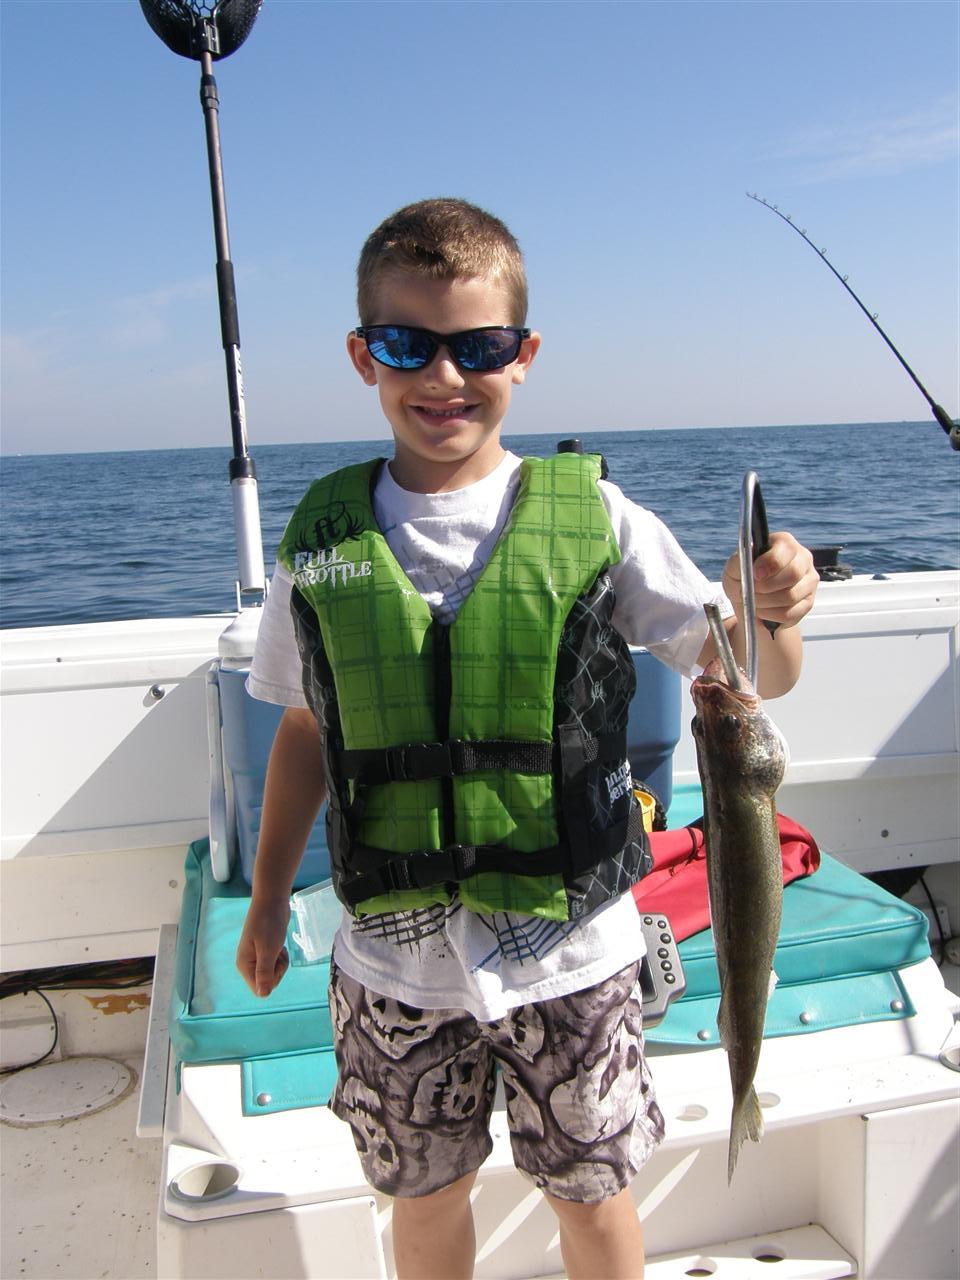 July 9th for Saginaw bay fishing